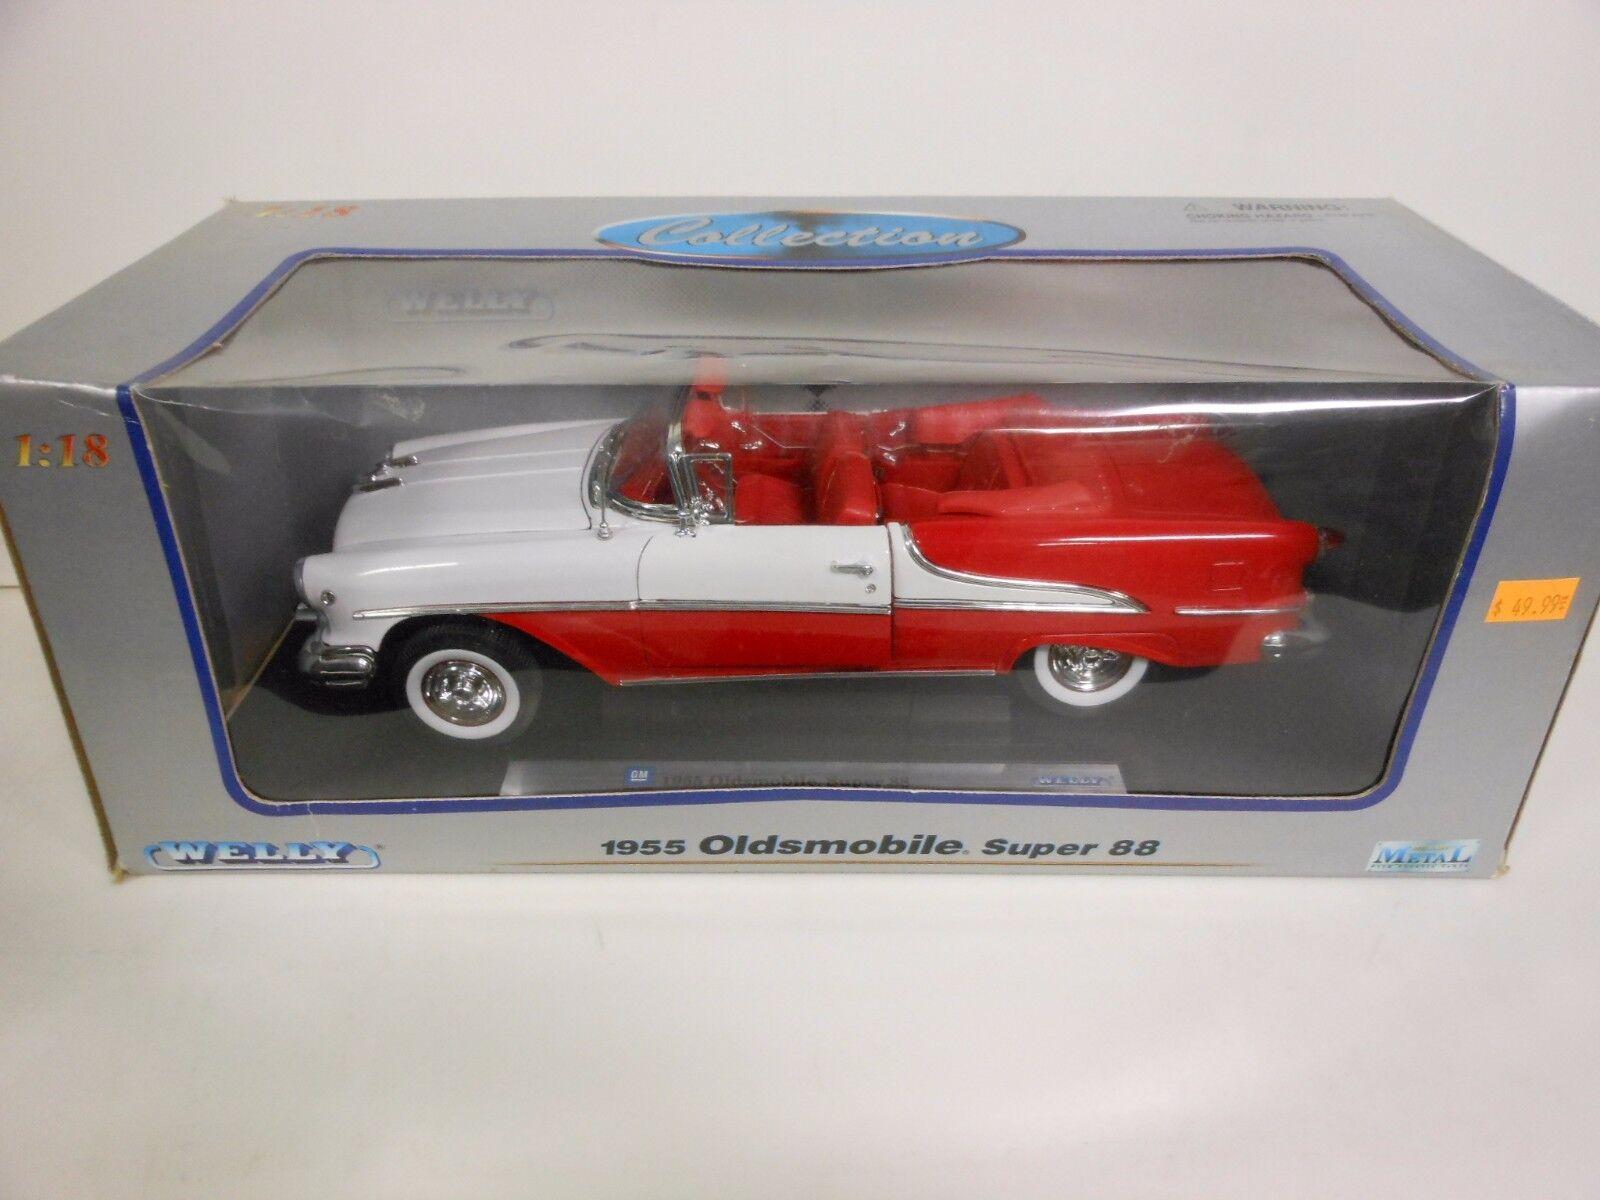 Ei 1955 oldsmobile super 88 (spritzguss 1,18 skala)